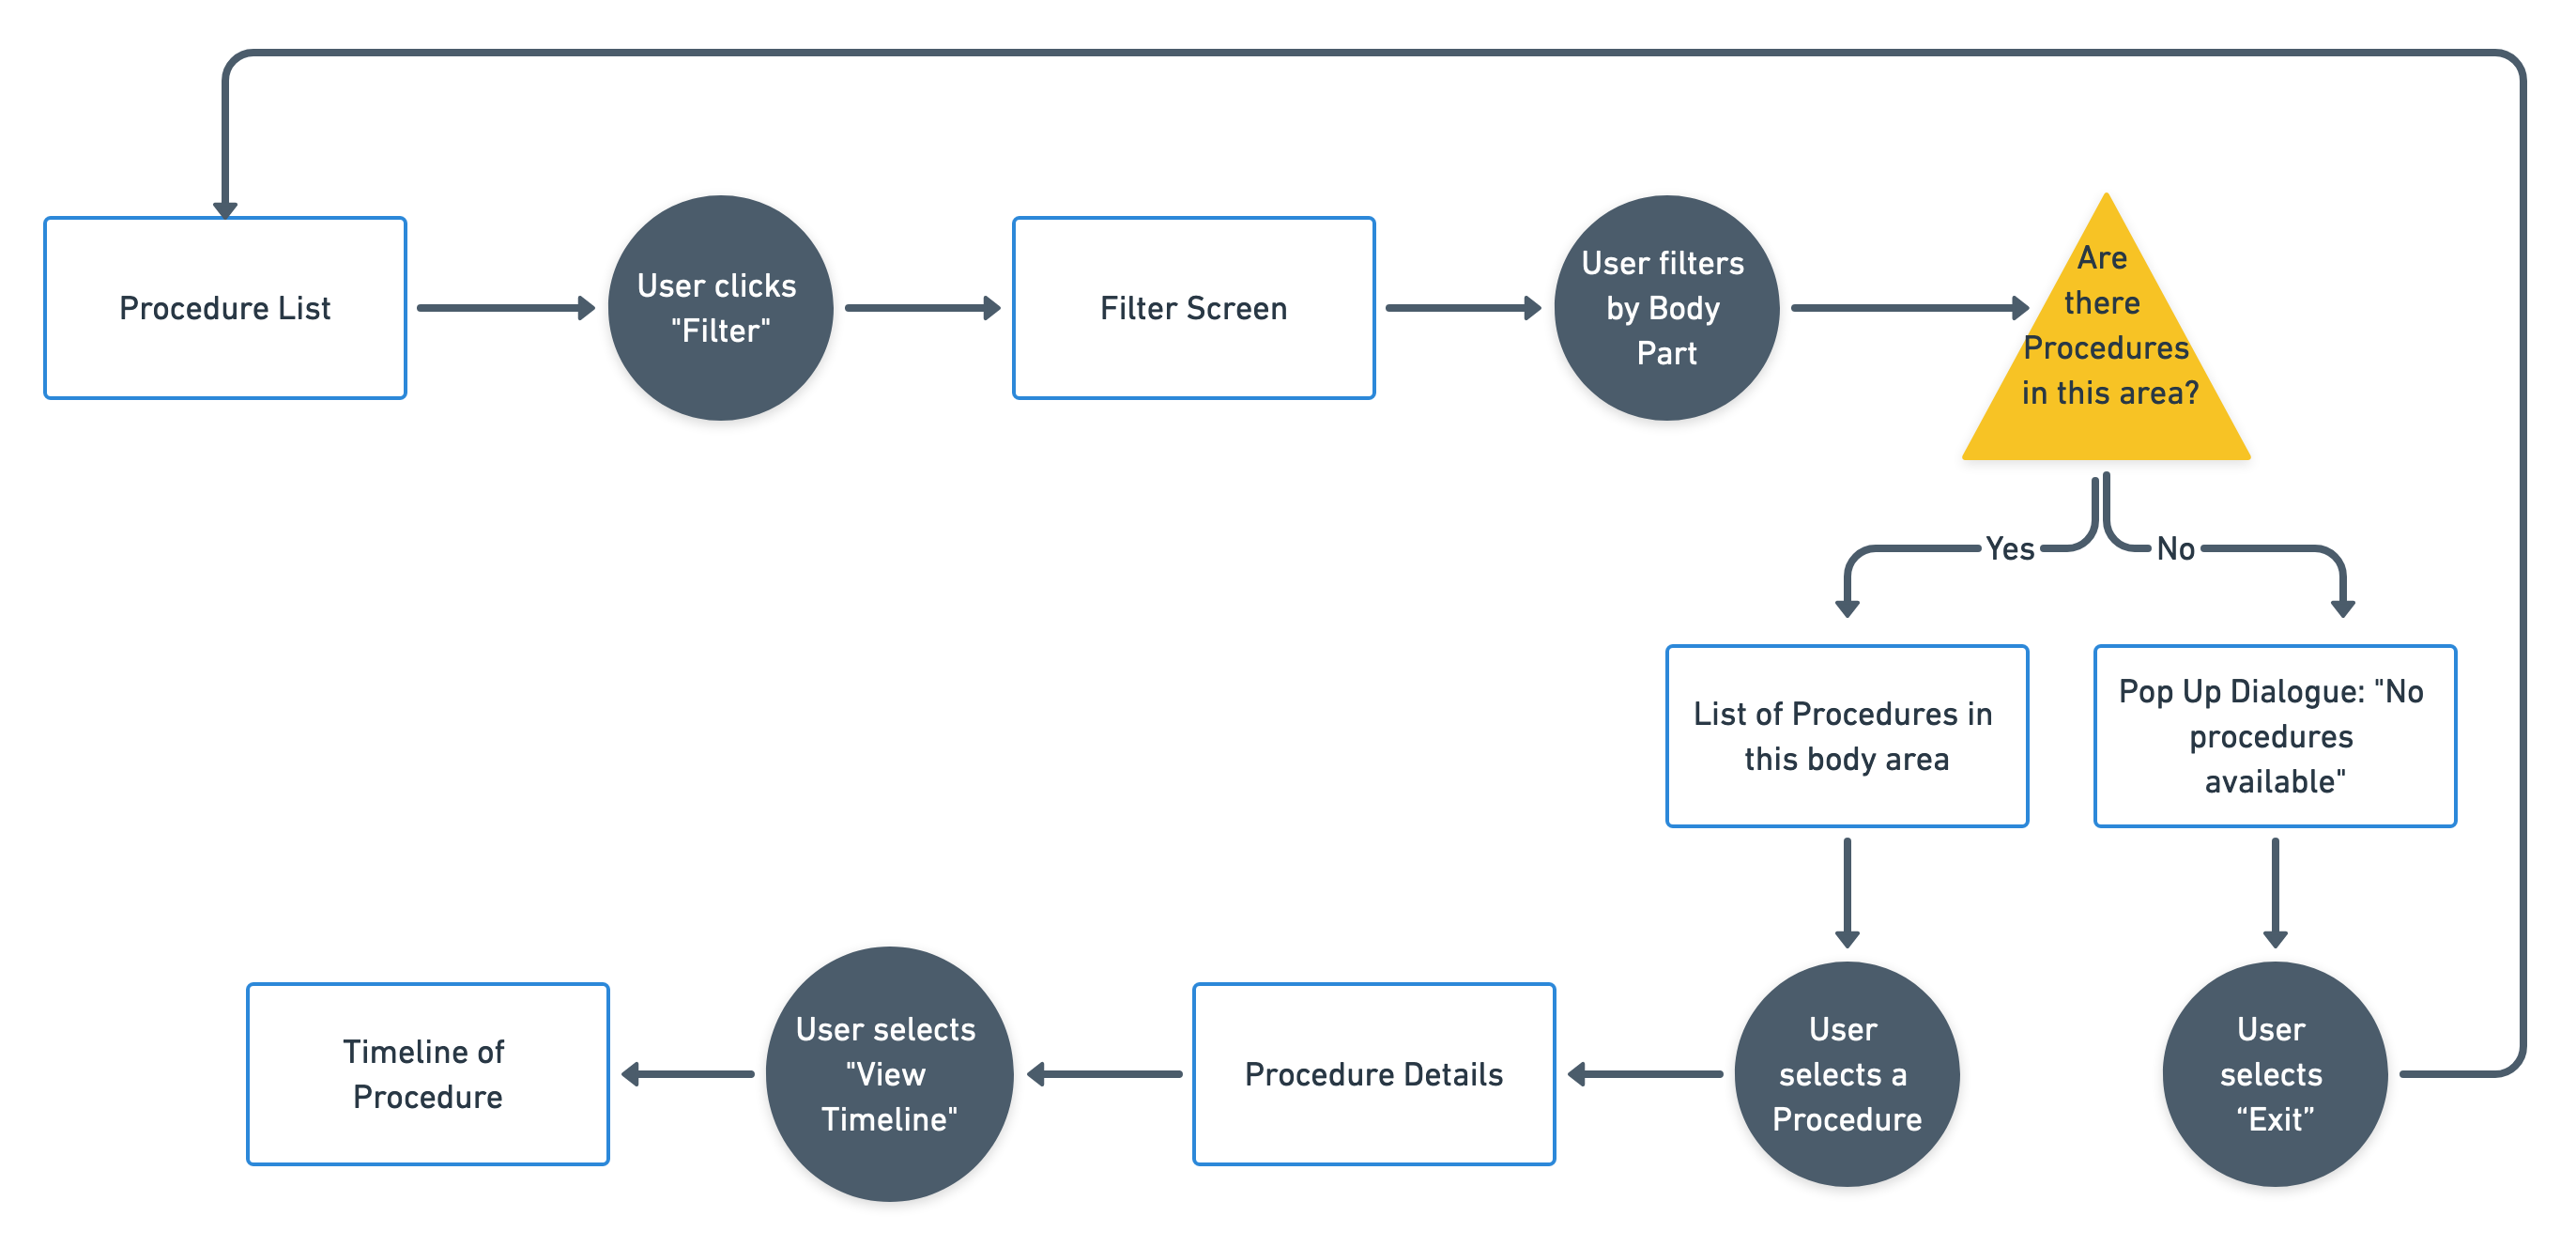 pf_chooseprocedure_flow